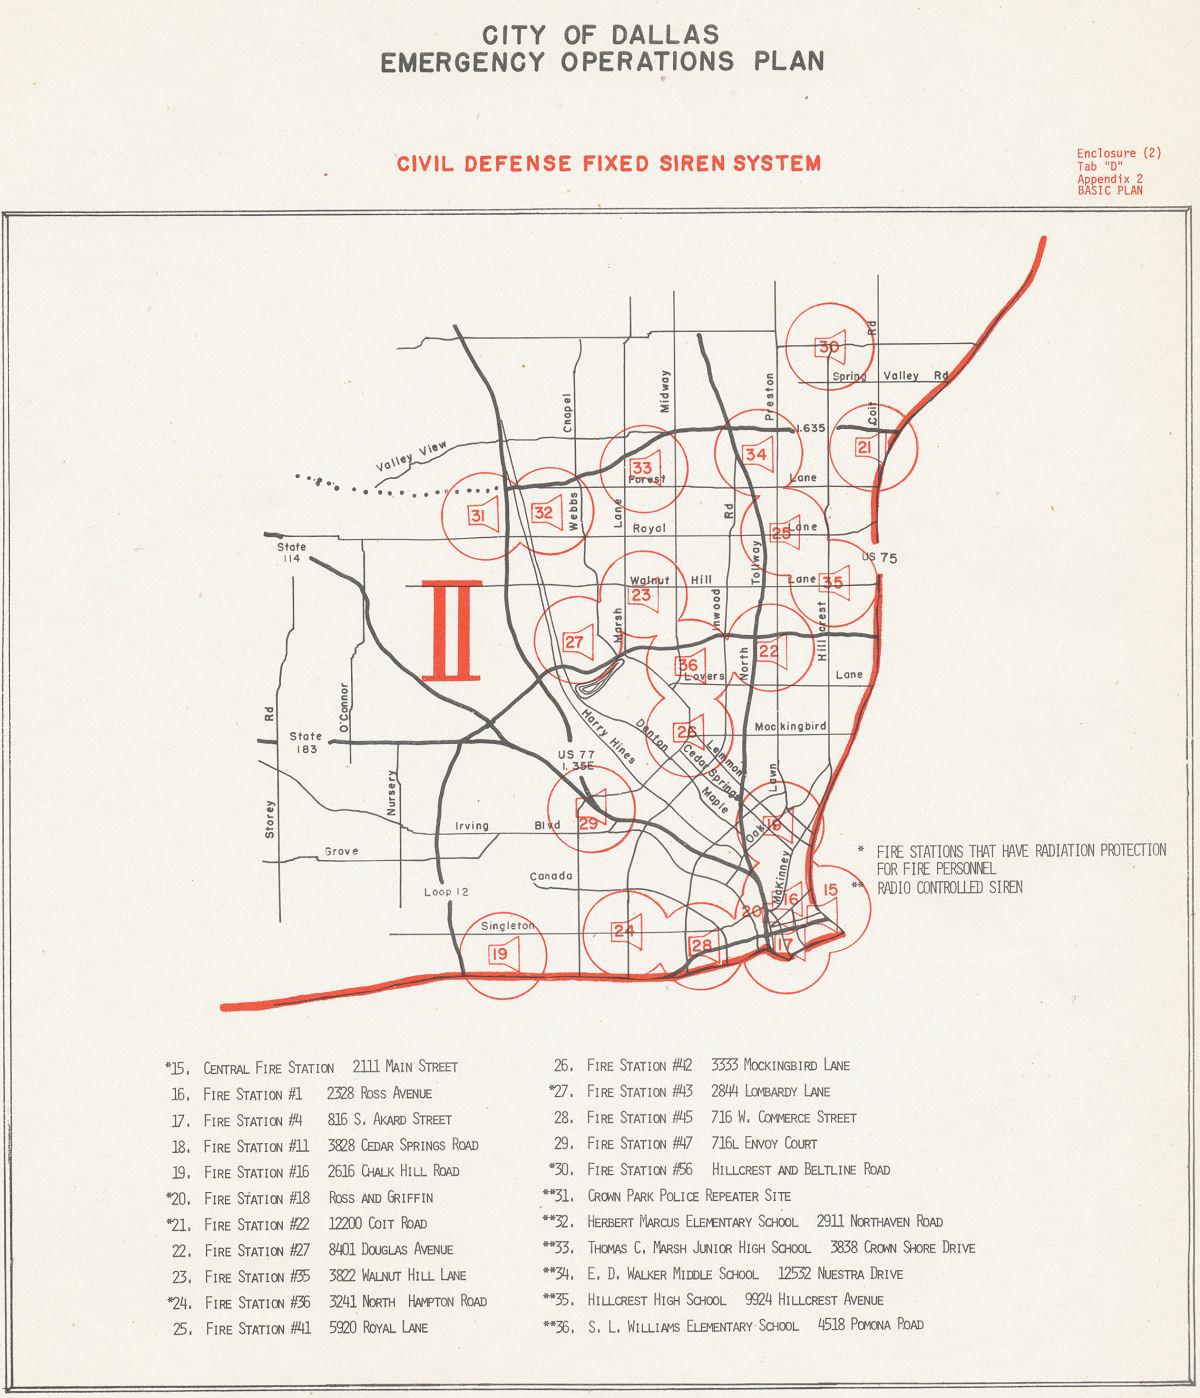 Fire Station Siren Wiring Diagram Schematic Diagrams Um3561 Generator Design Civil Defense Museum Warning Sirens City Of Dallas Texas White Thunderbolt